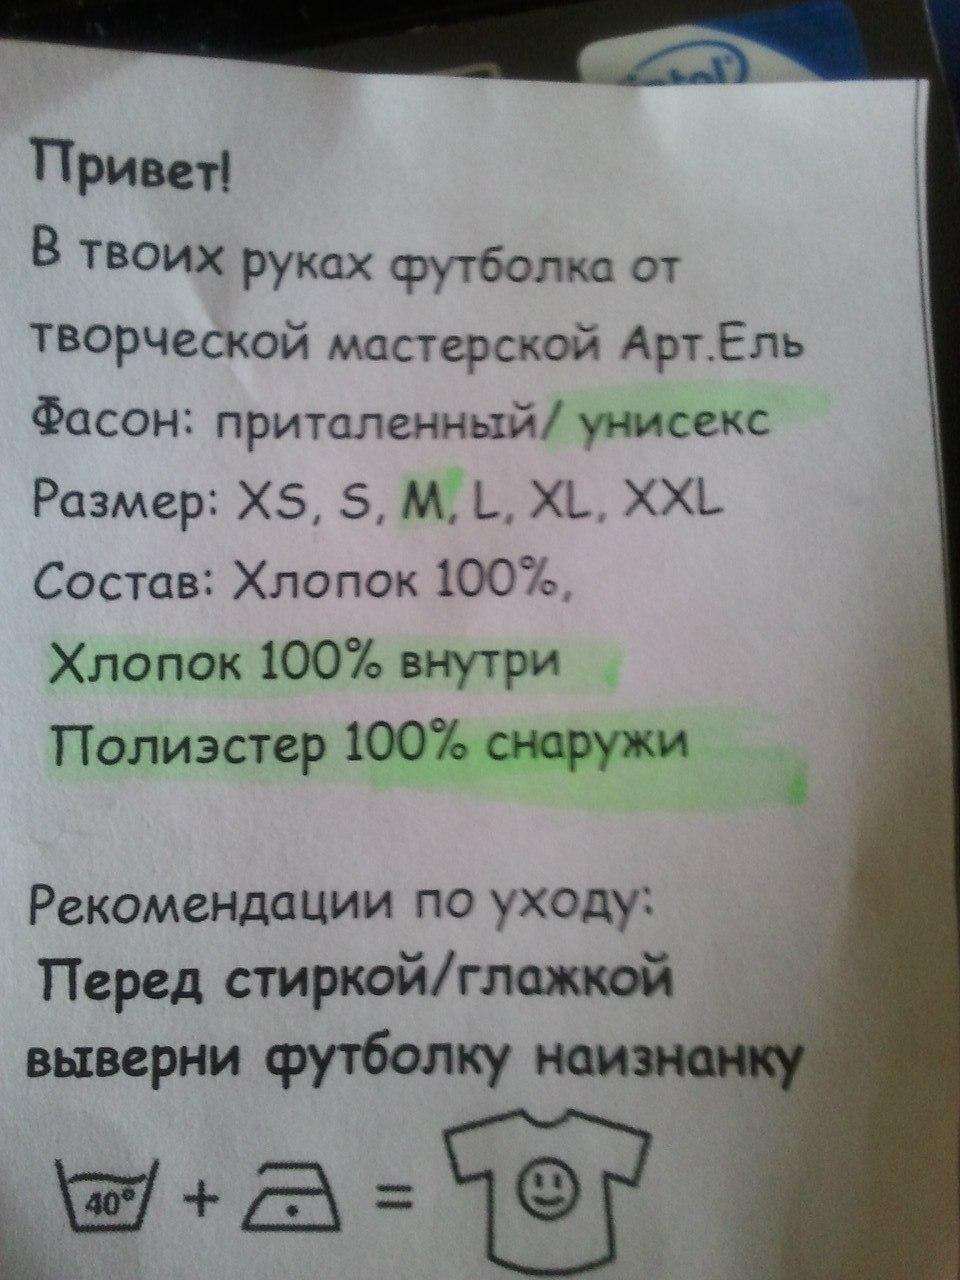 hExNYSPeu5U.jpg